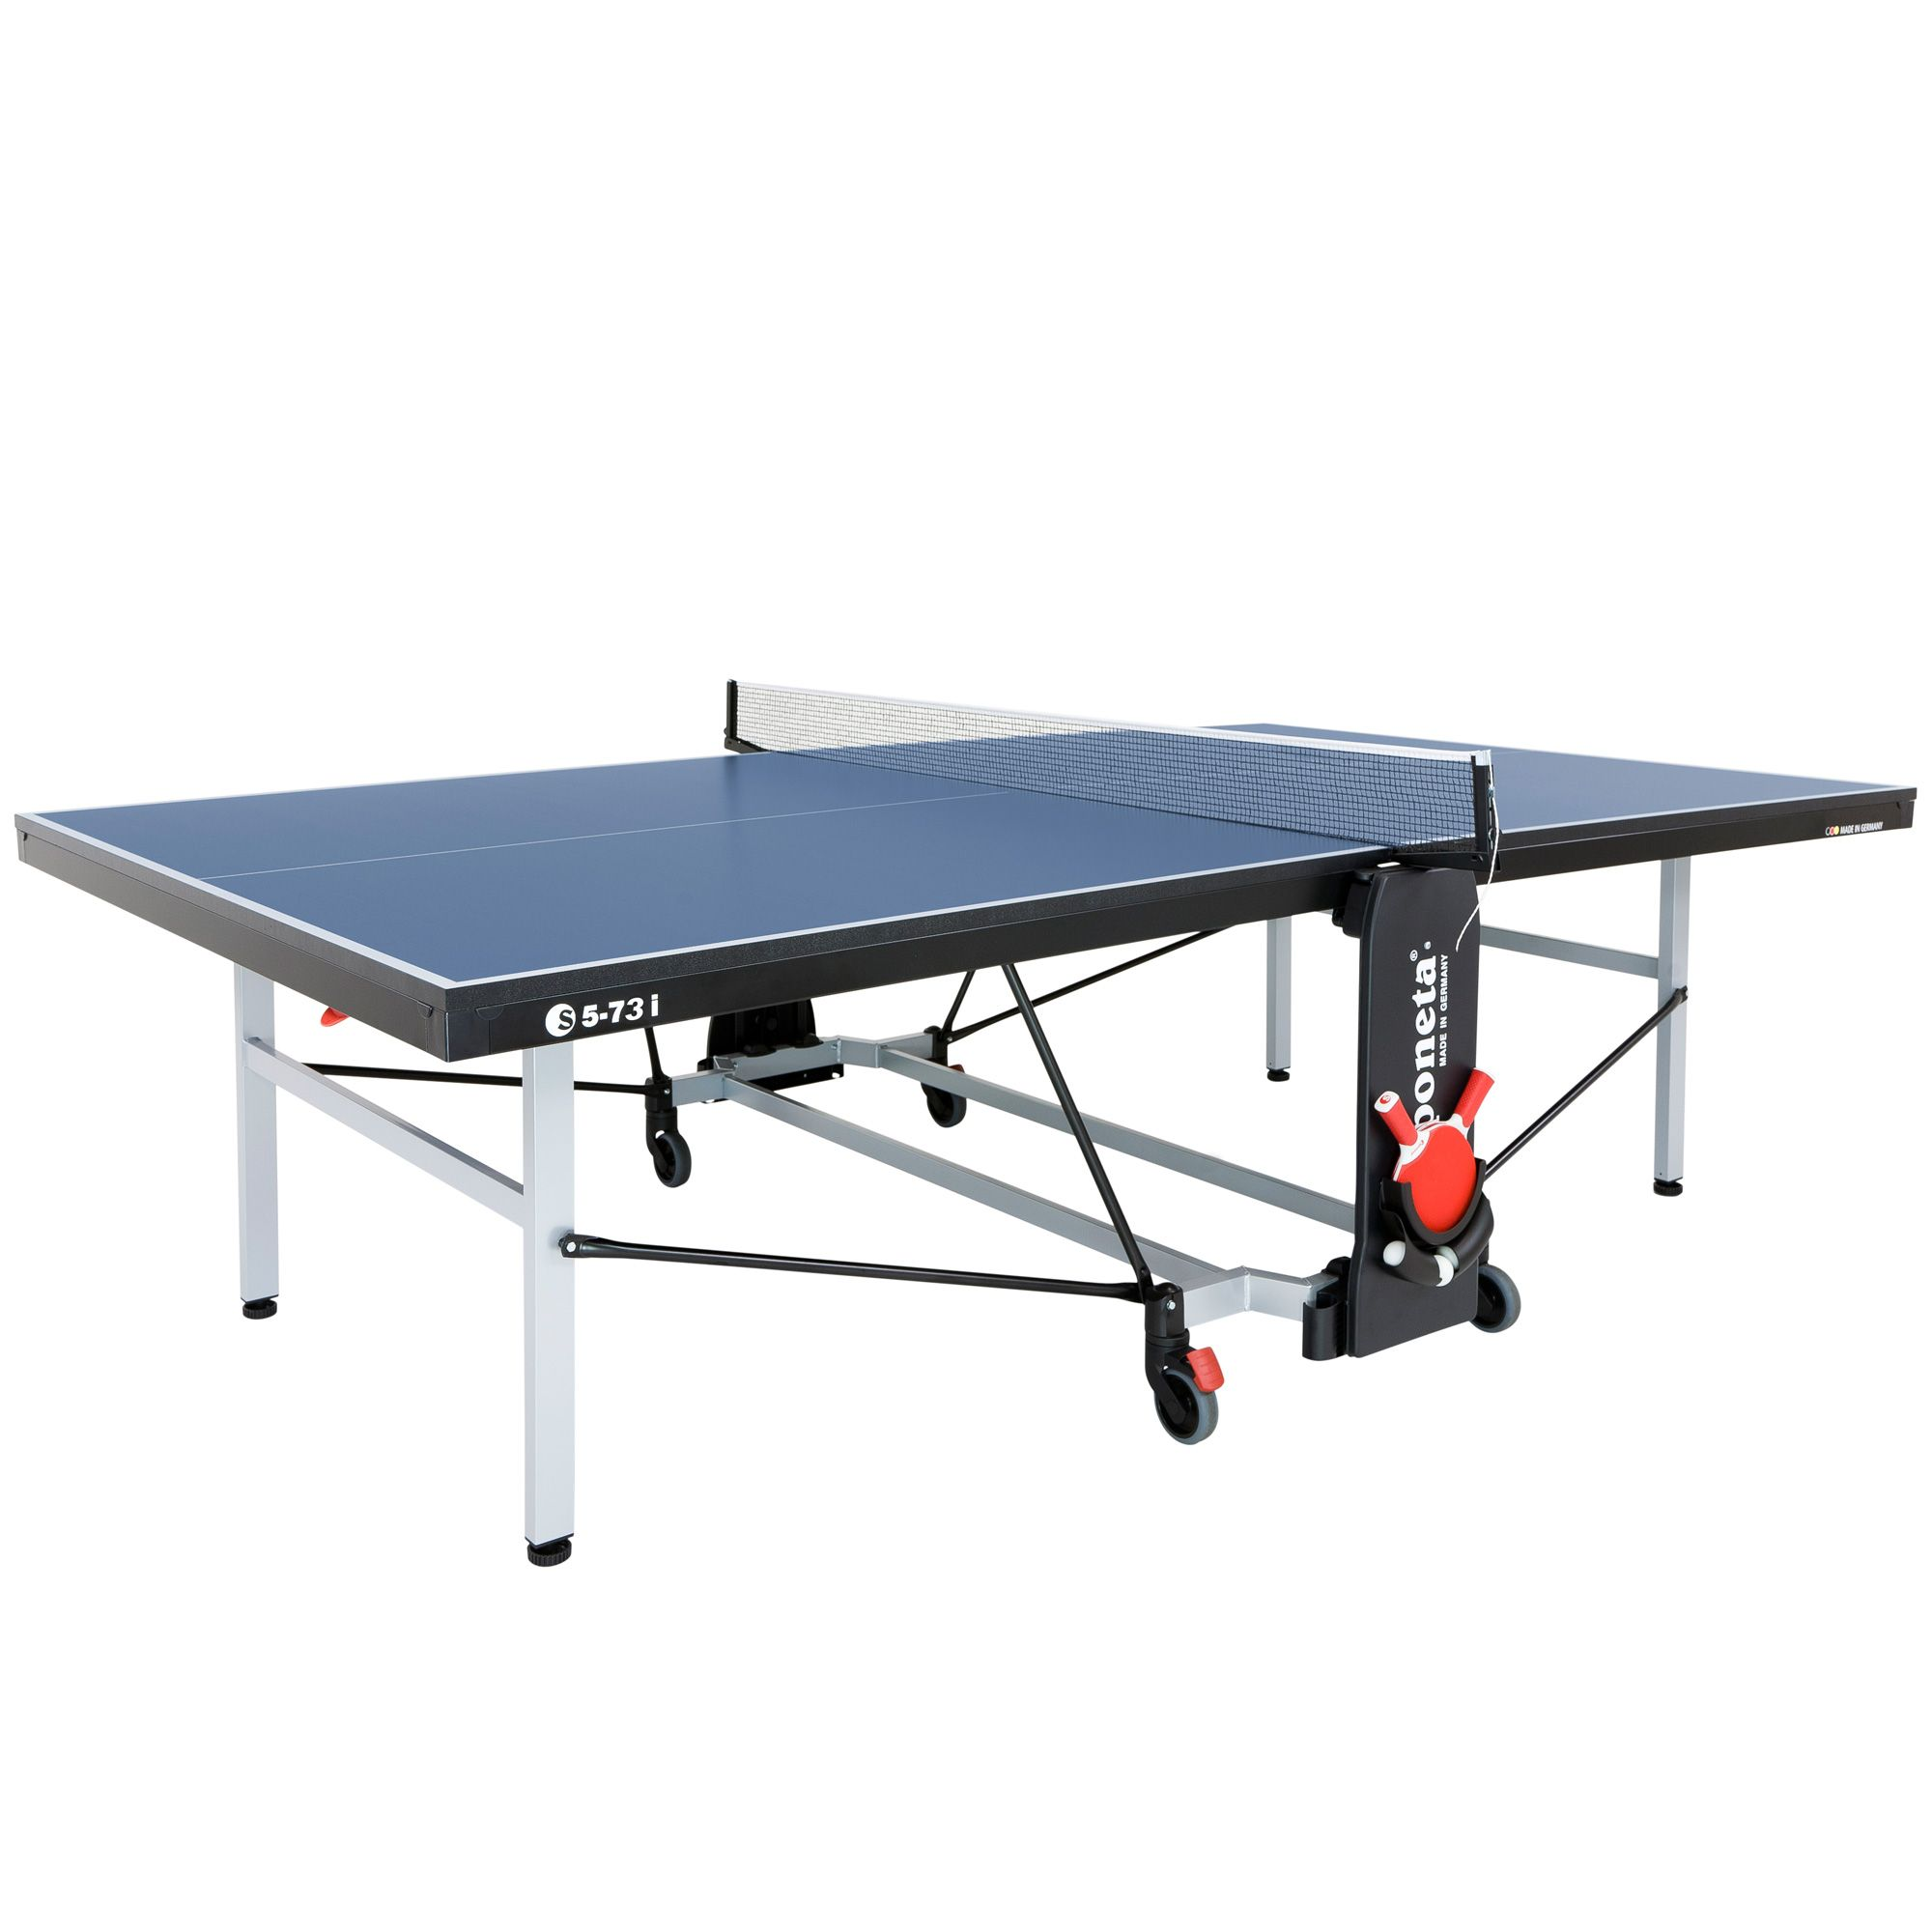 Sponeta schooline indoor table tennis table - Sponeta table tennis table ...